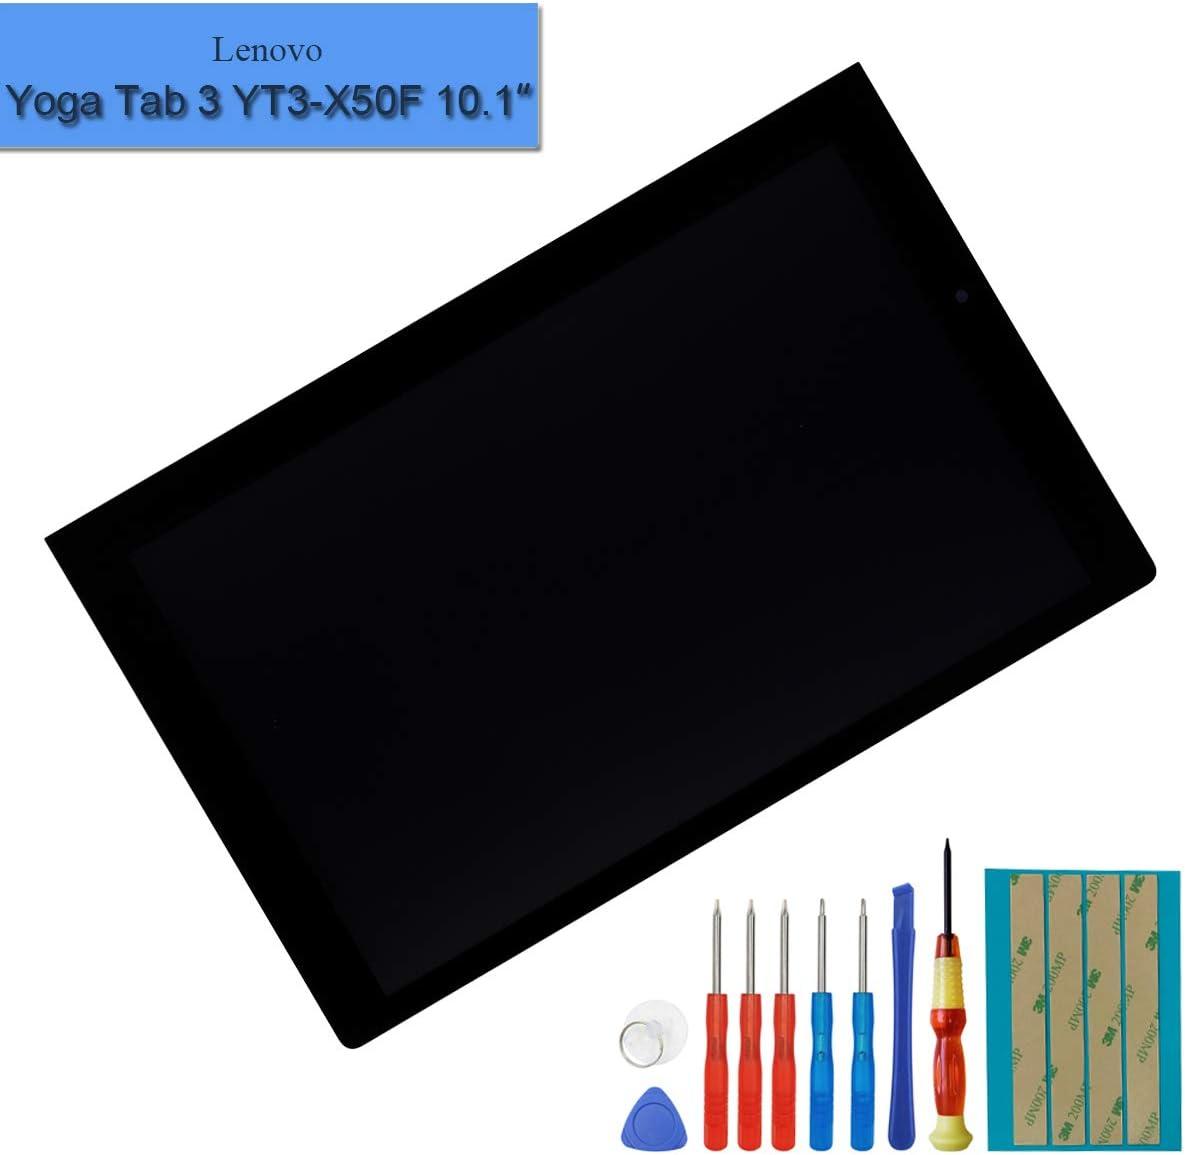 modulo display Lenovo Yoga Tab 3 YT3-X50F 10.1 LCD